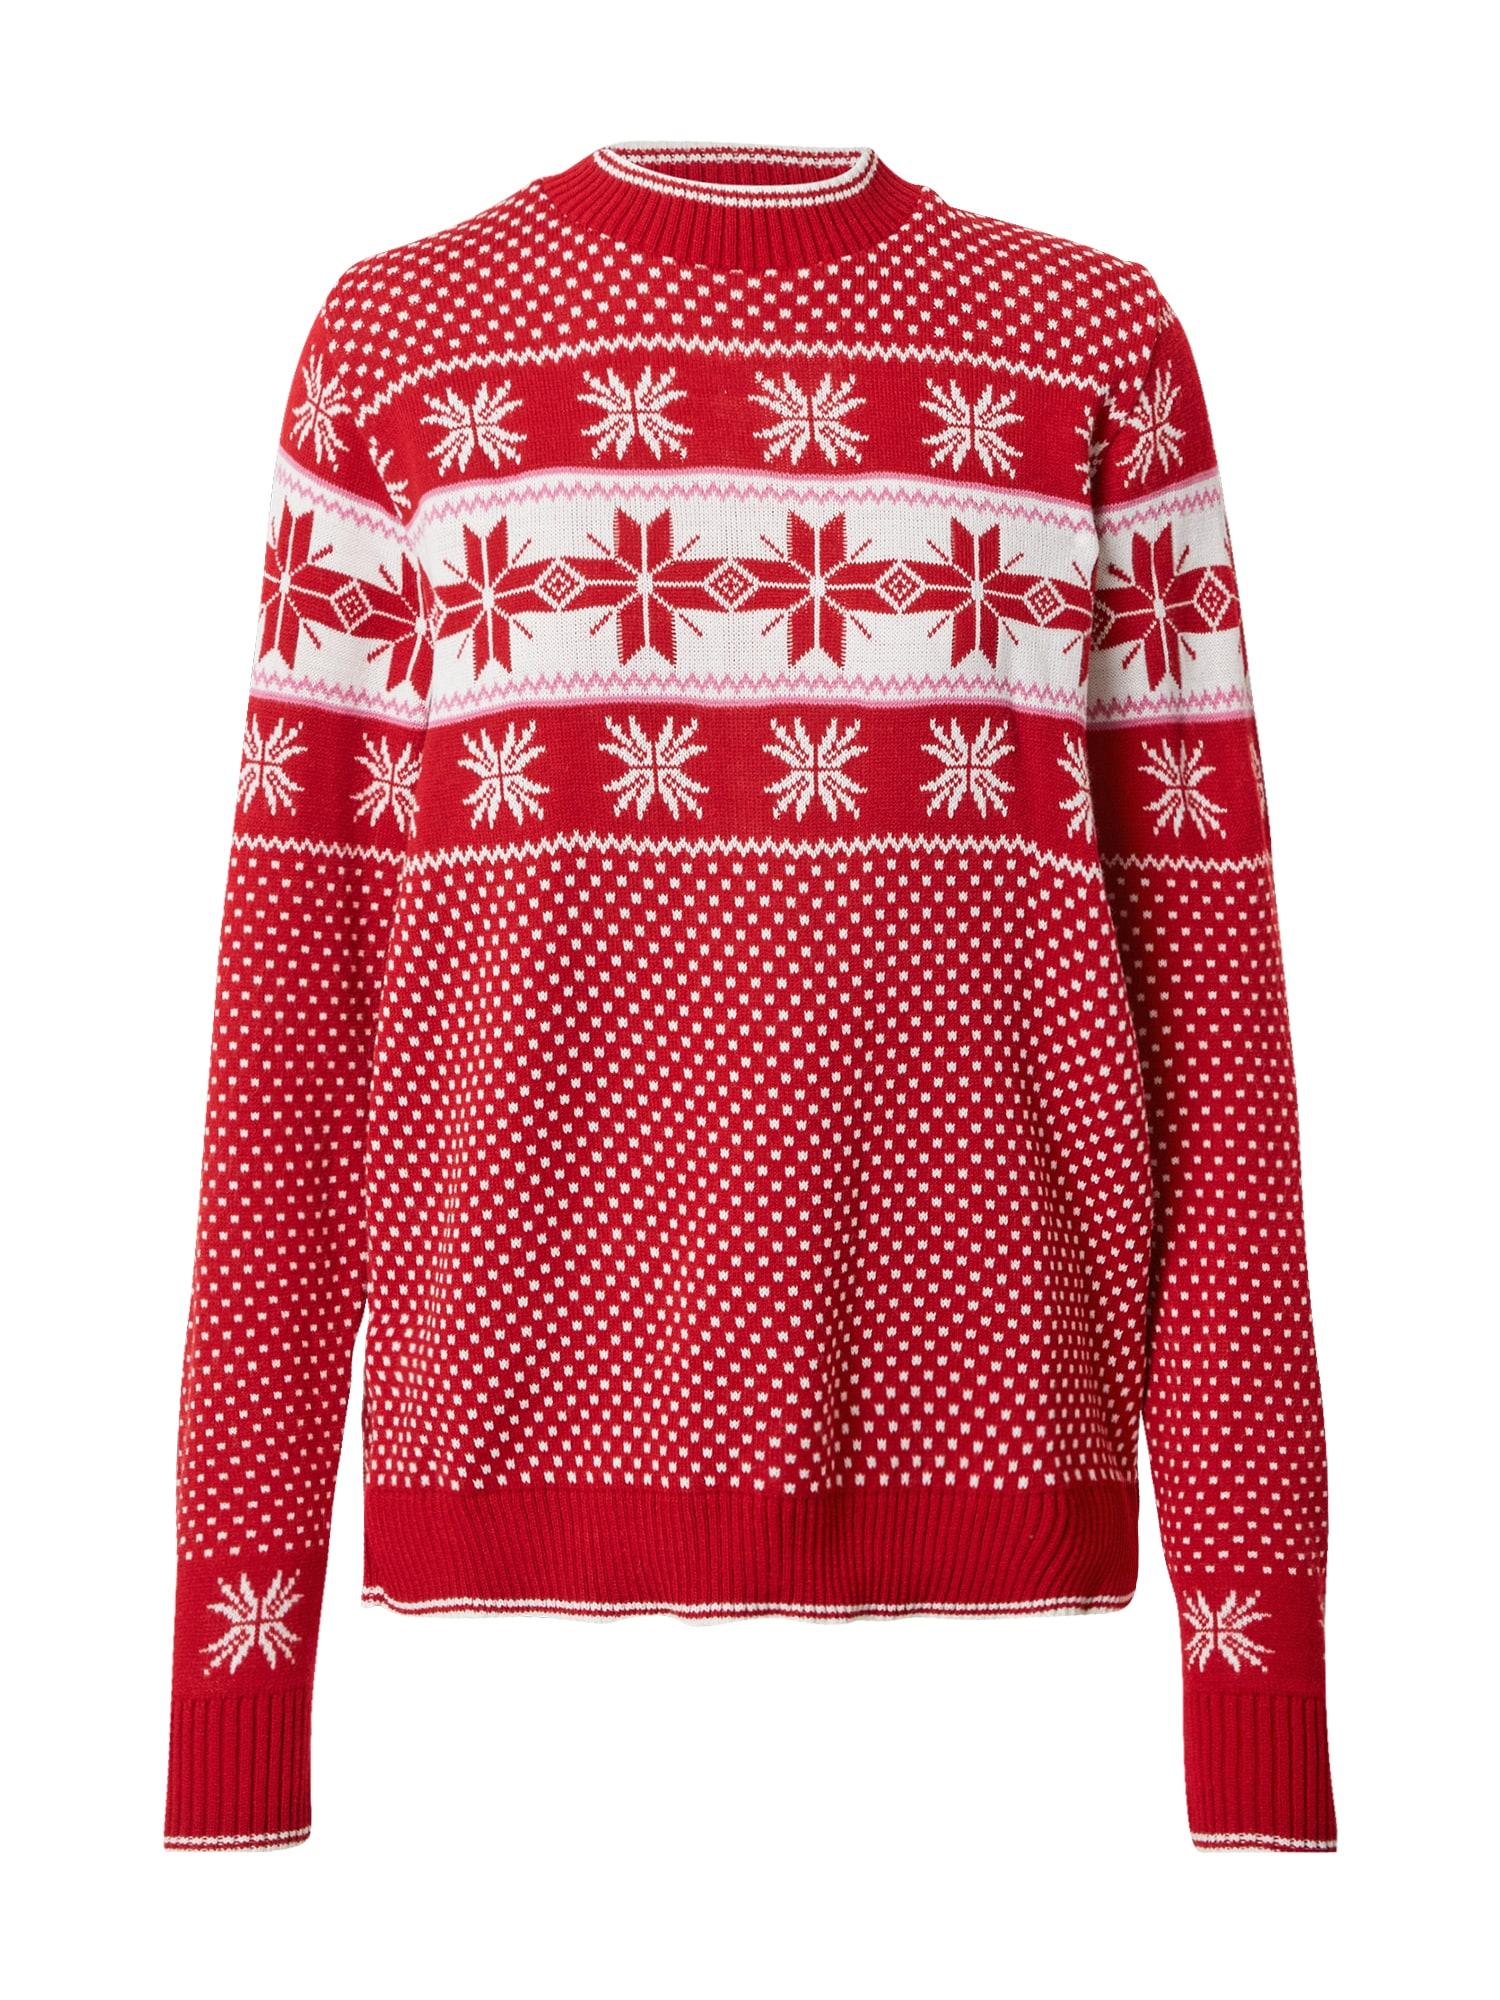 Missguided (Petite) Megztinis raudona / balta